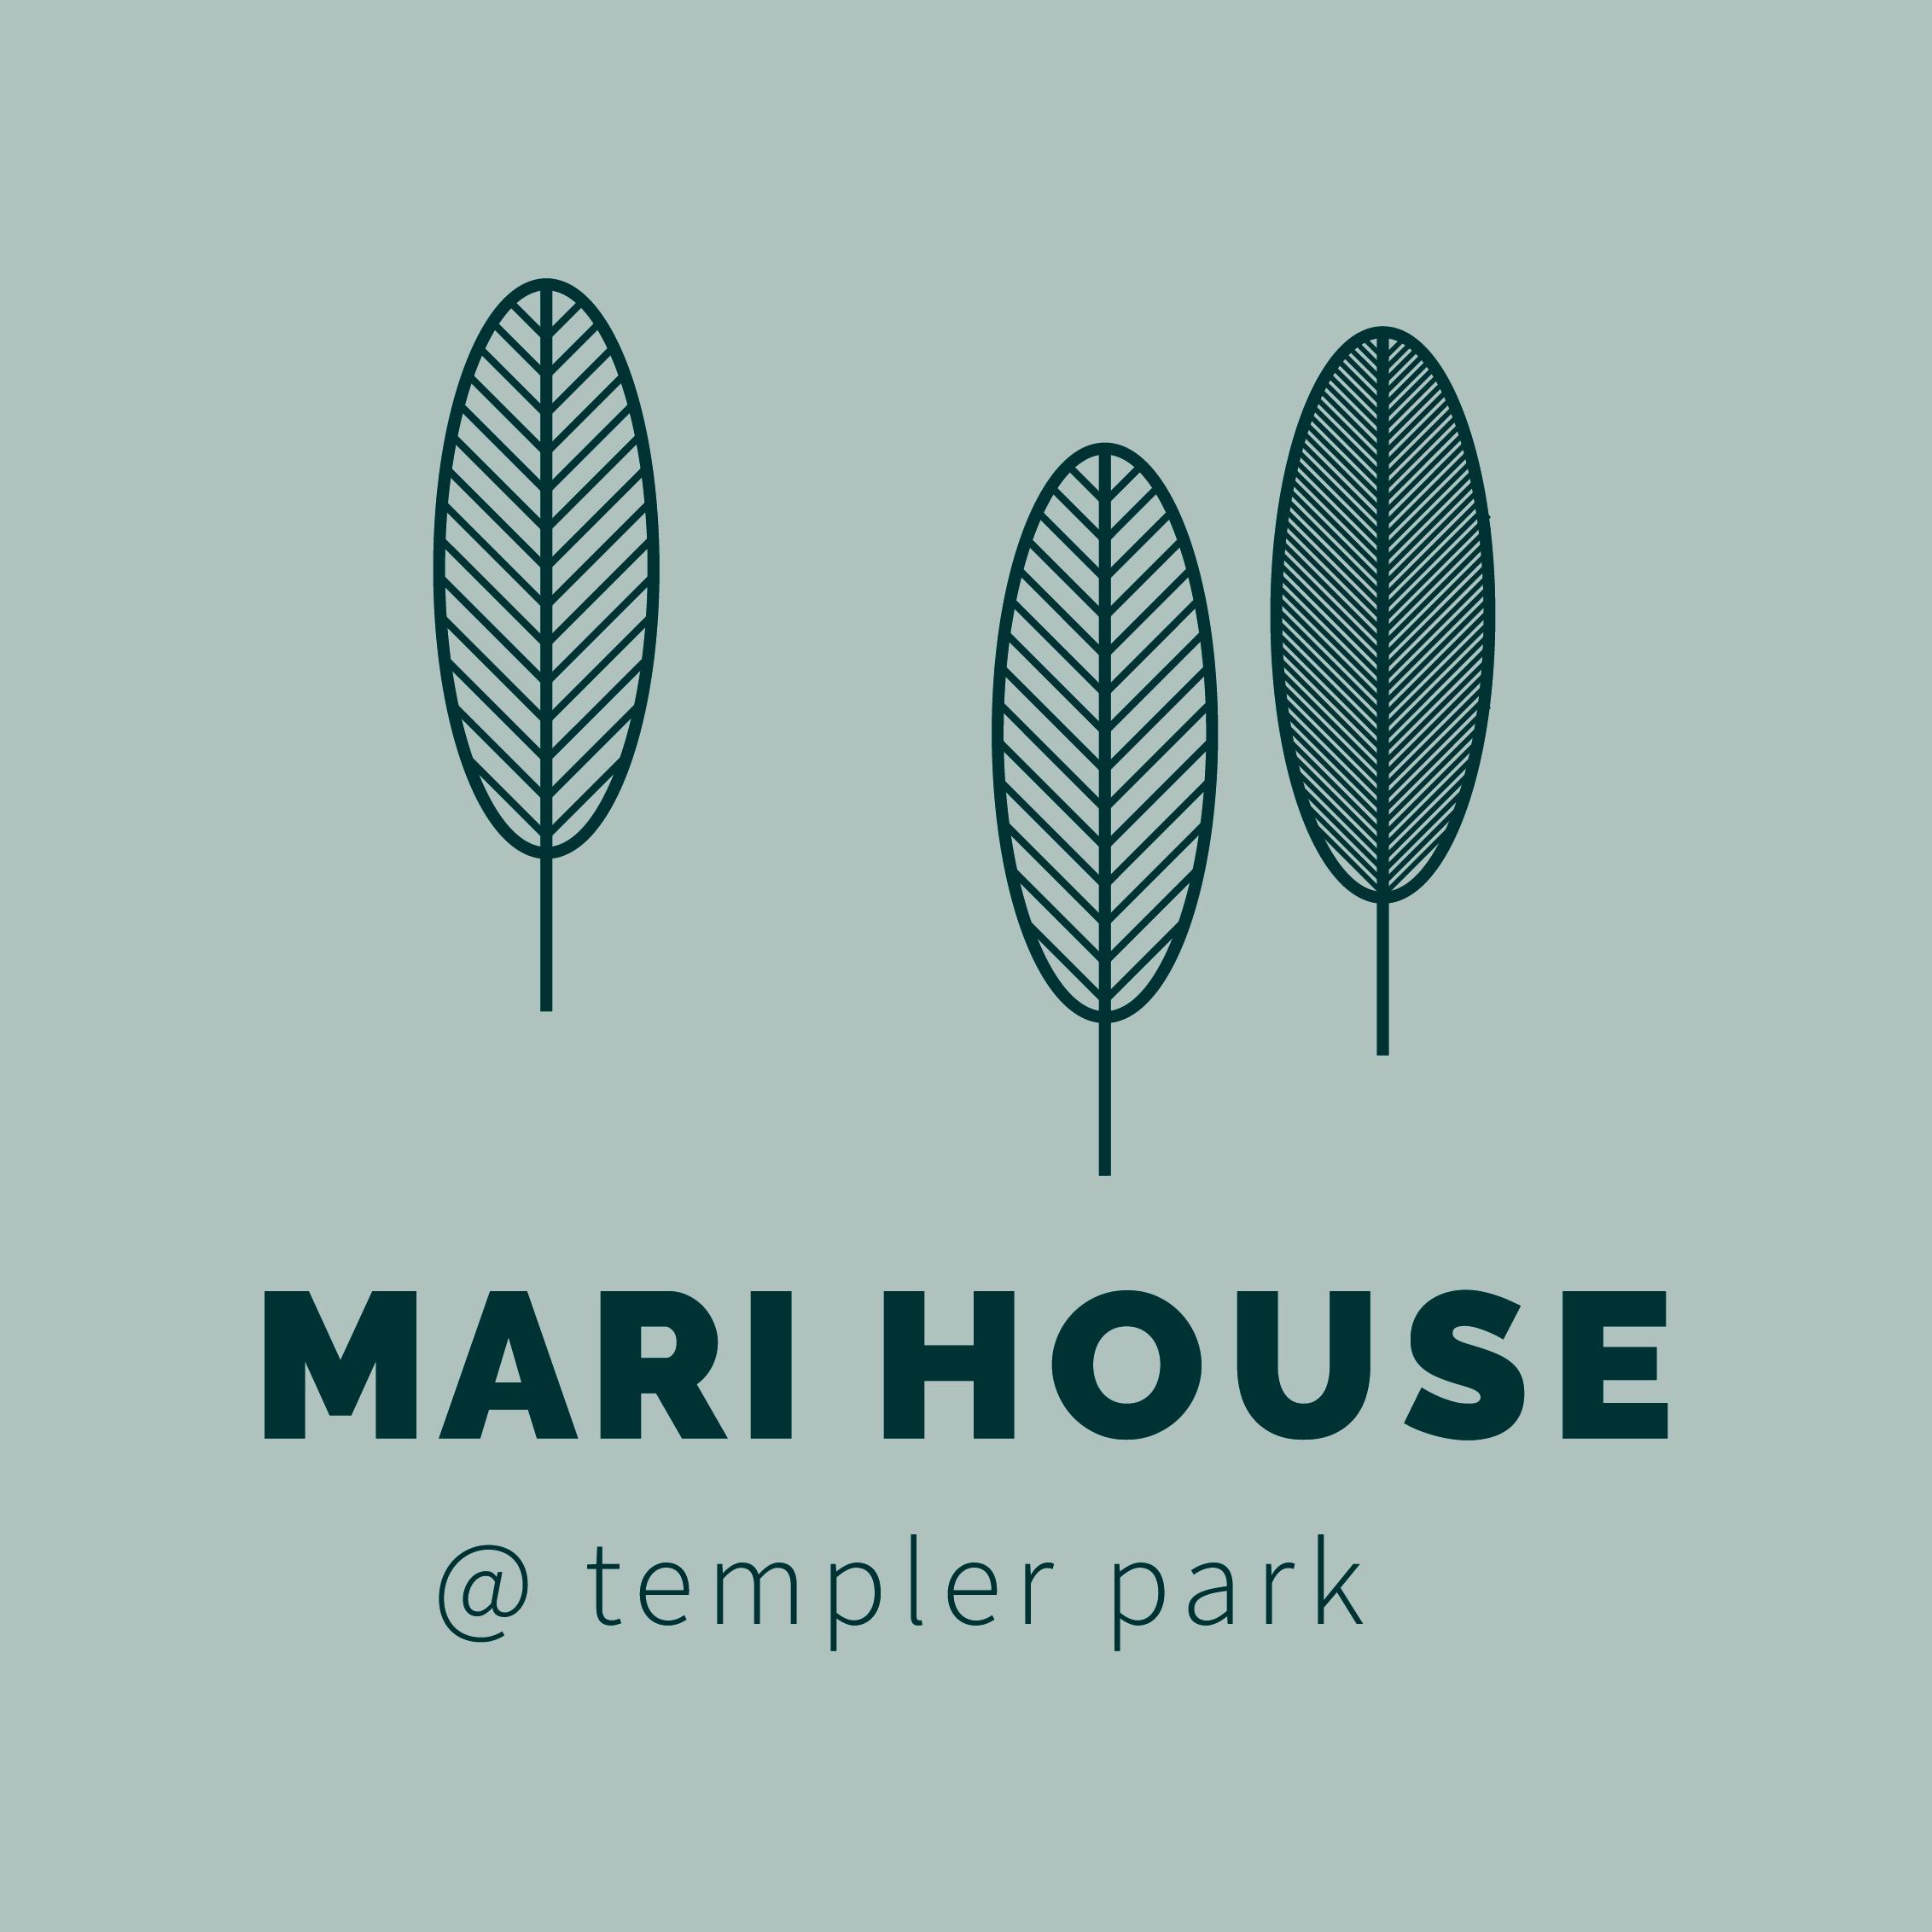 MariHouse